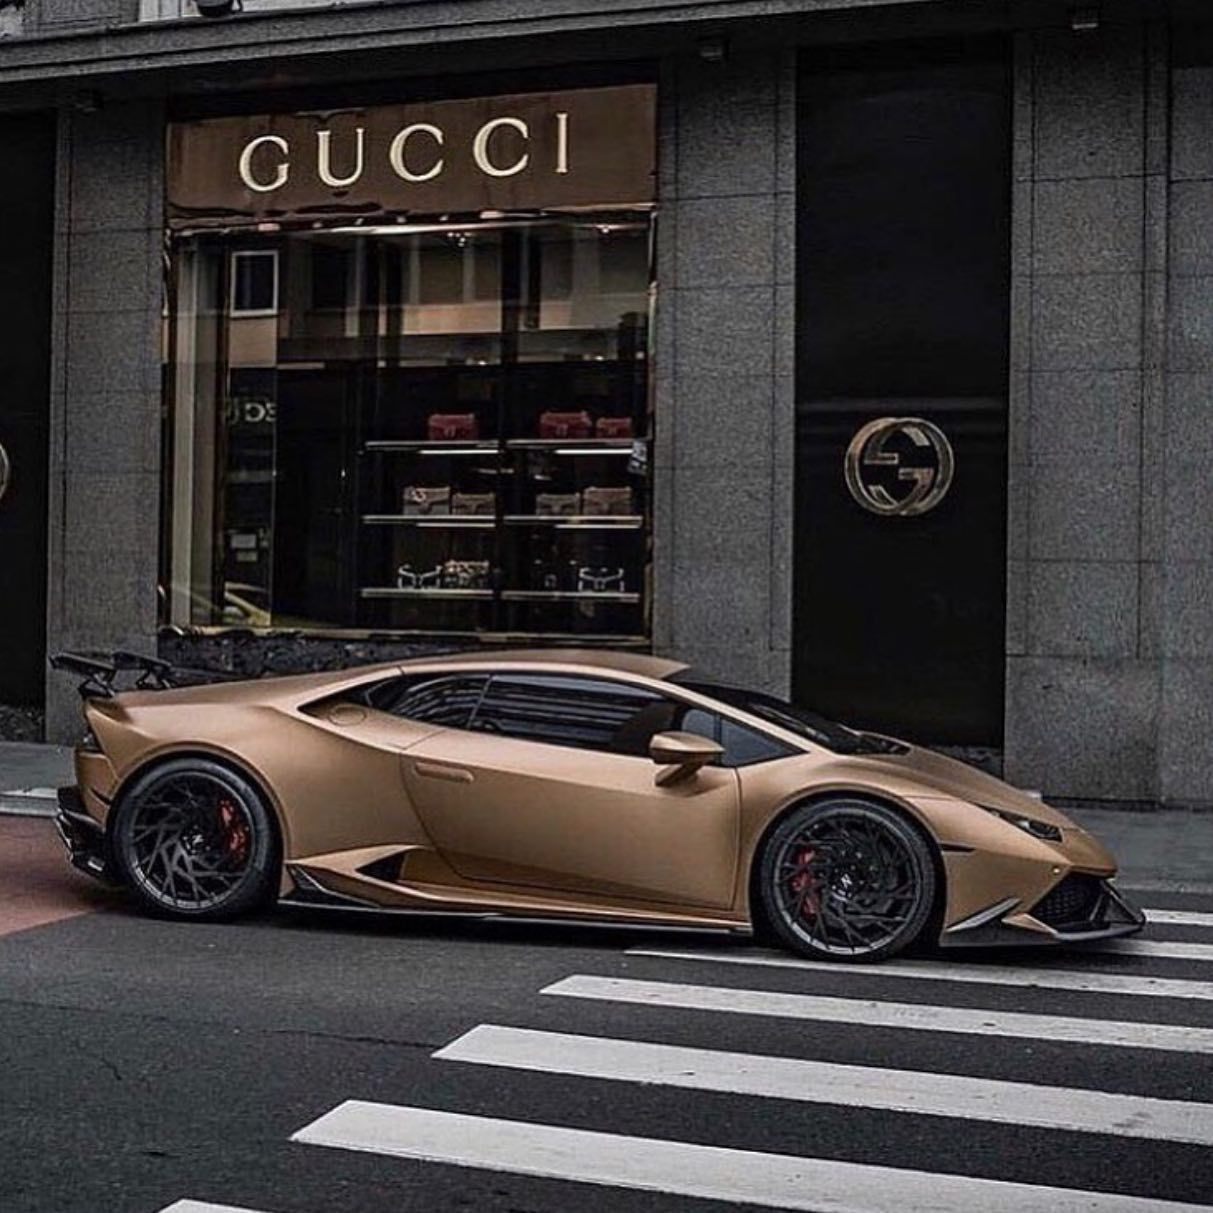 Pin on Gucci blog